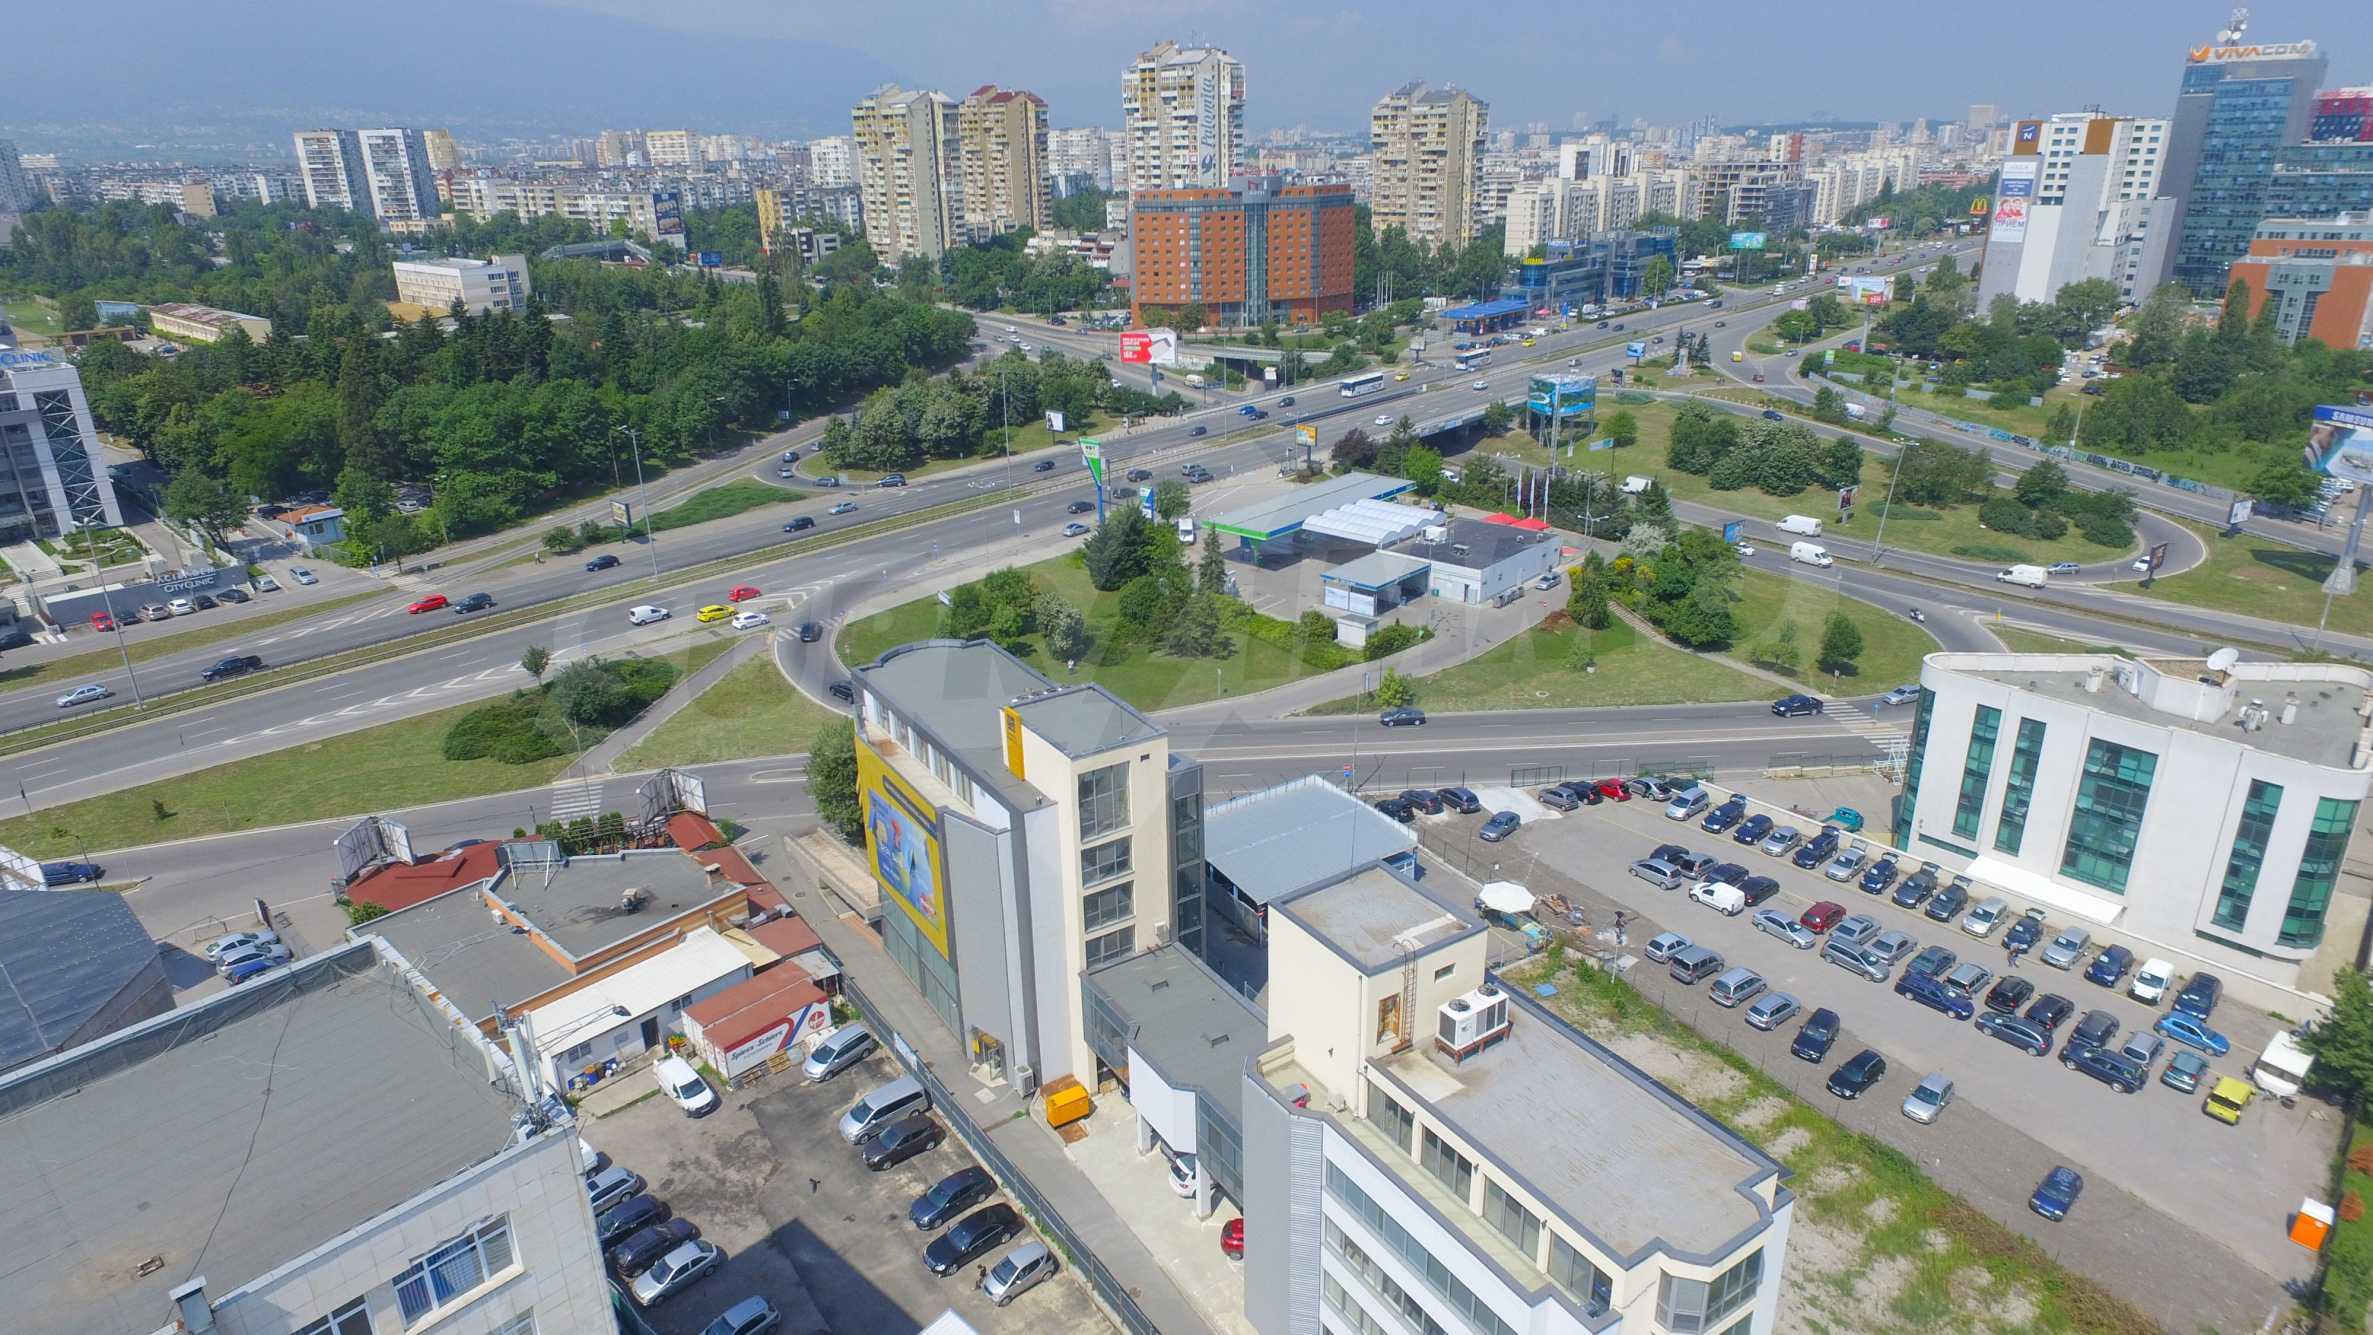 Офис в бизнес сграда висок клас на бул. Цариградско шосе 44